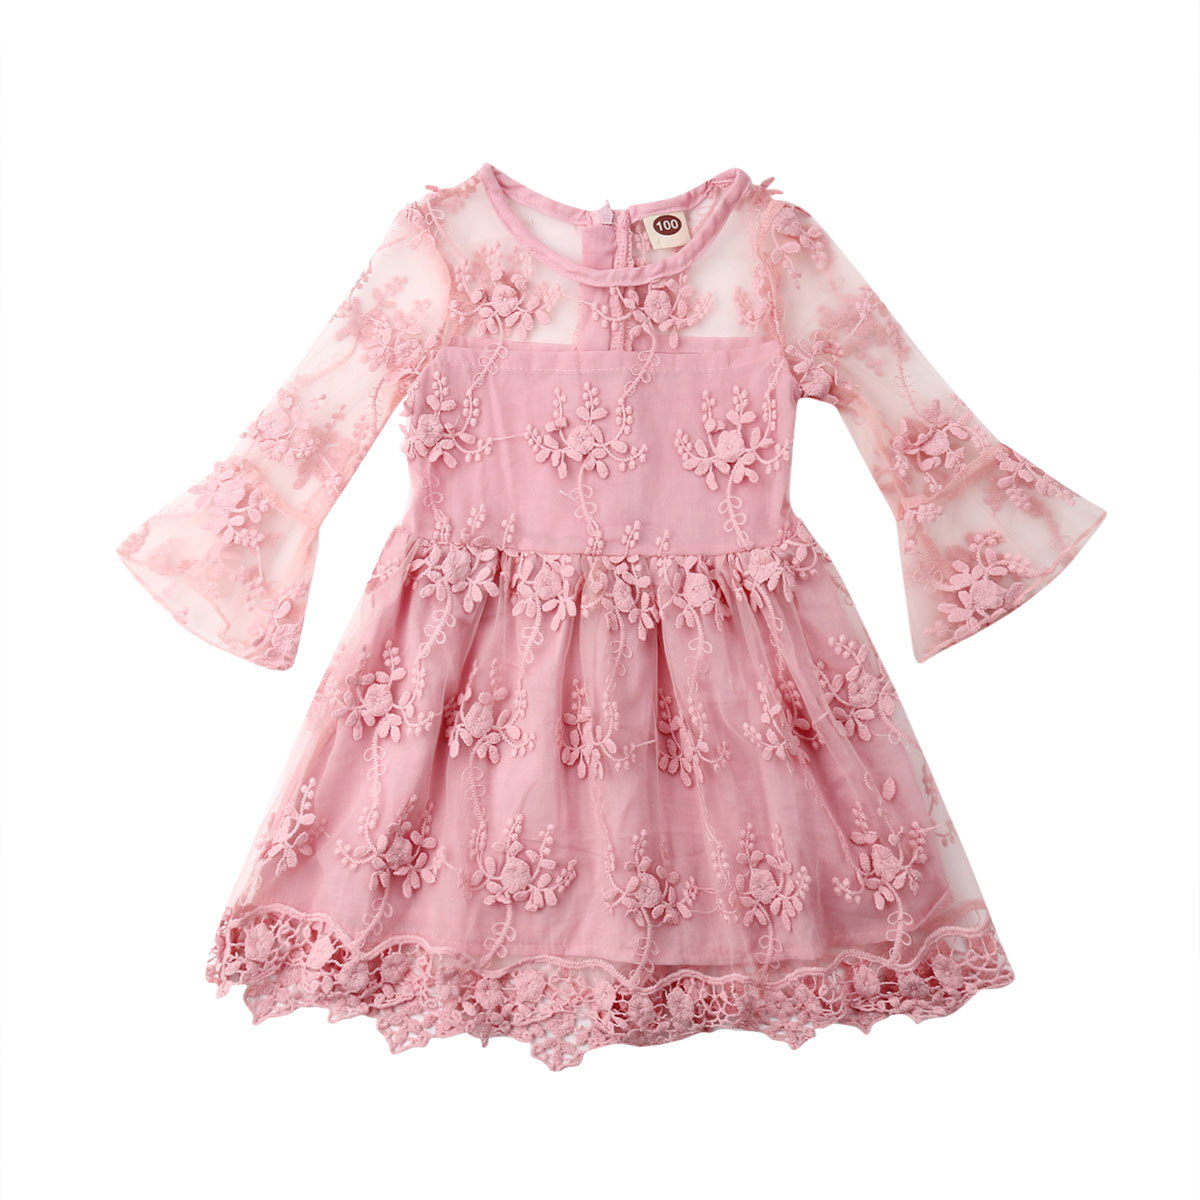 BNWT Baby Girl 0 Mix Brand Pink Lady Keyhole Fleece Track Pants